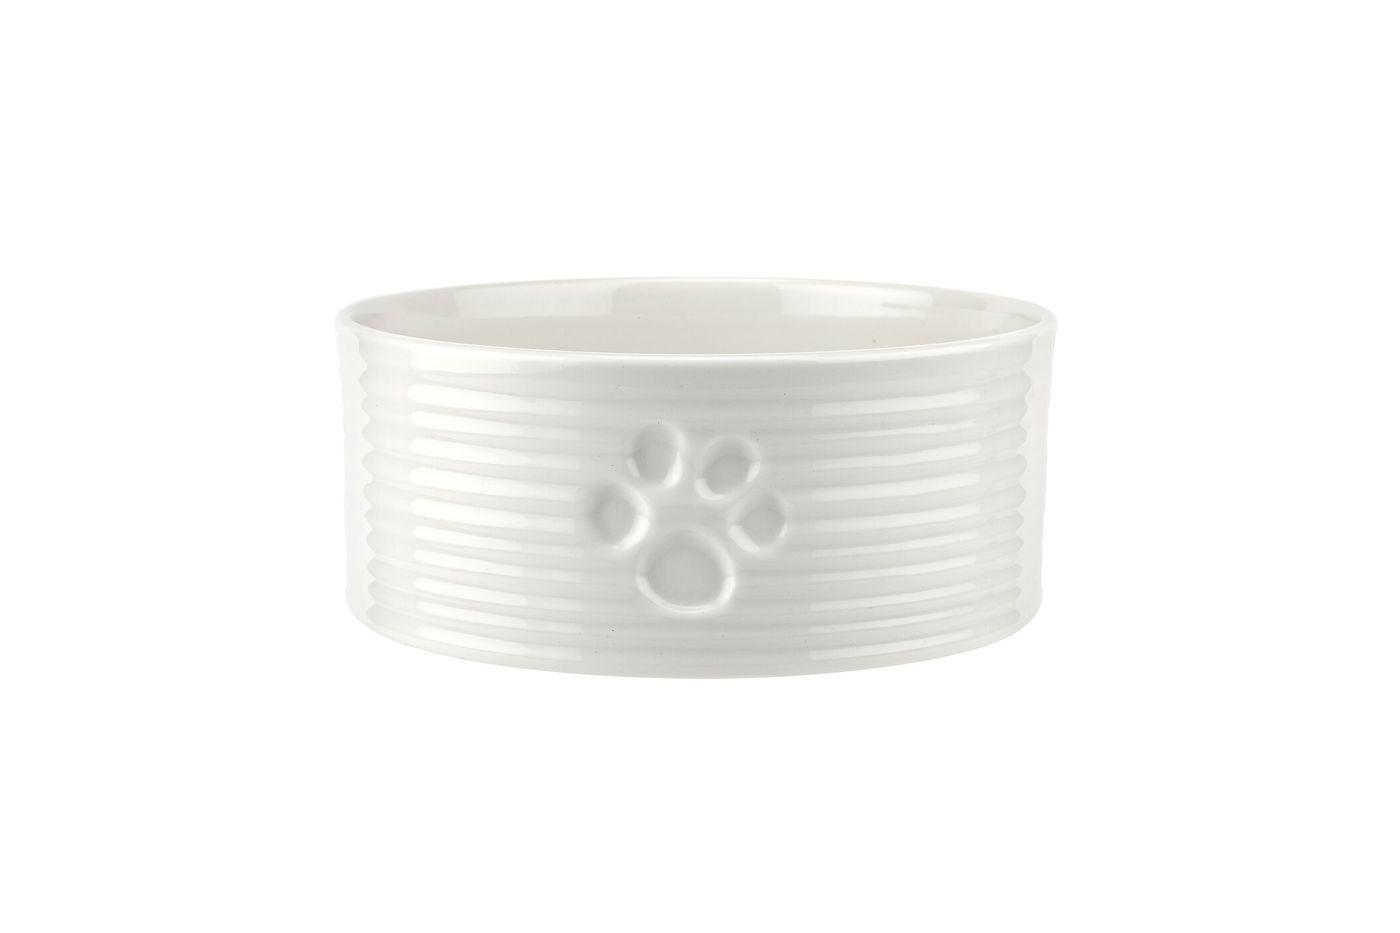 Sophie Conran for Portmeirion White Pet Bowl 15.25cm thumb 1